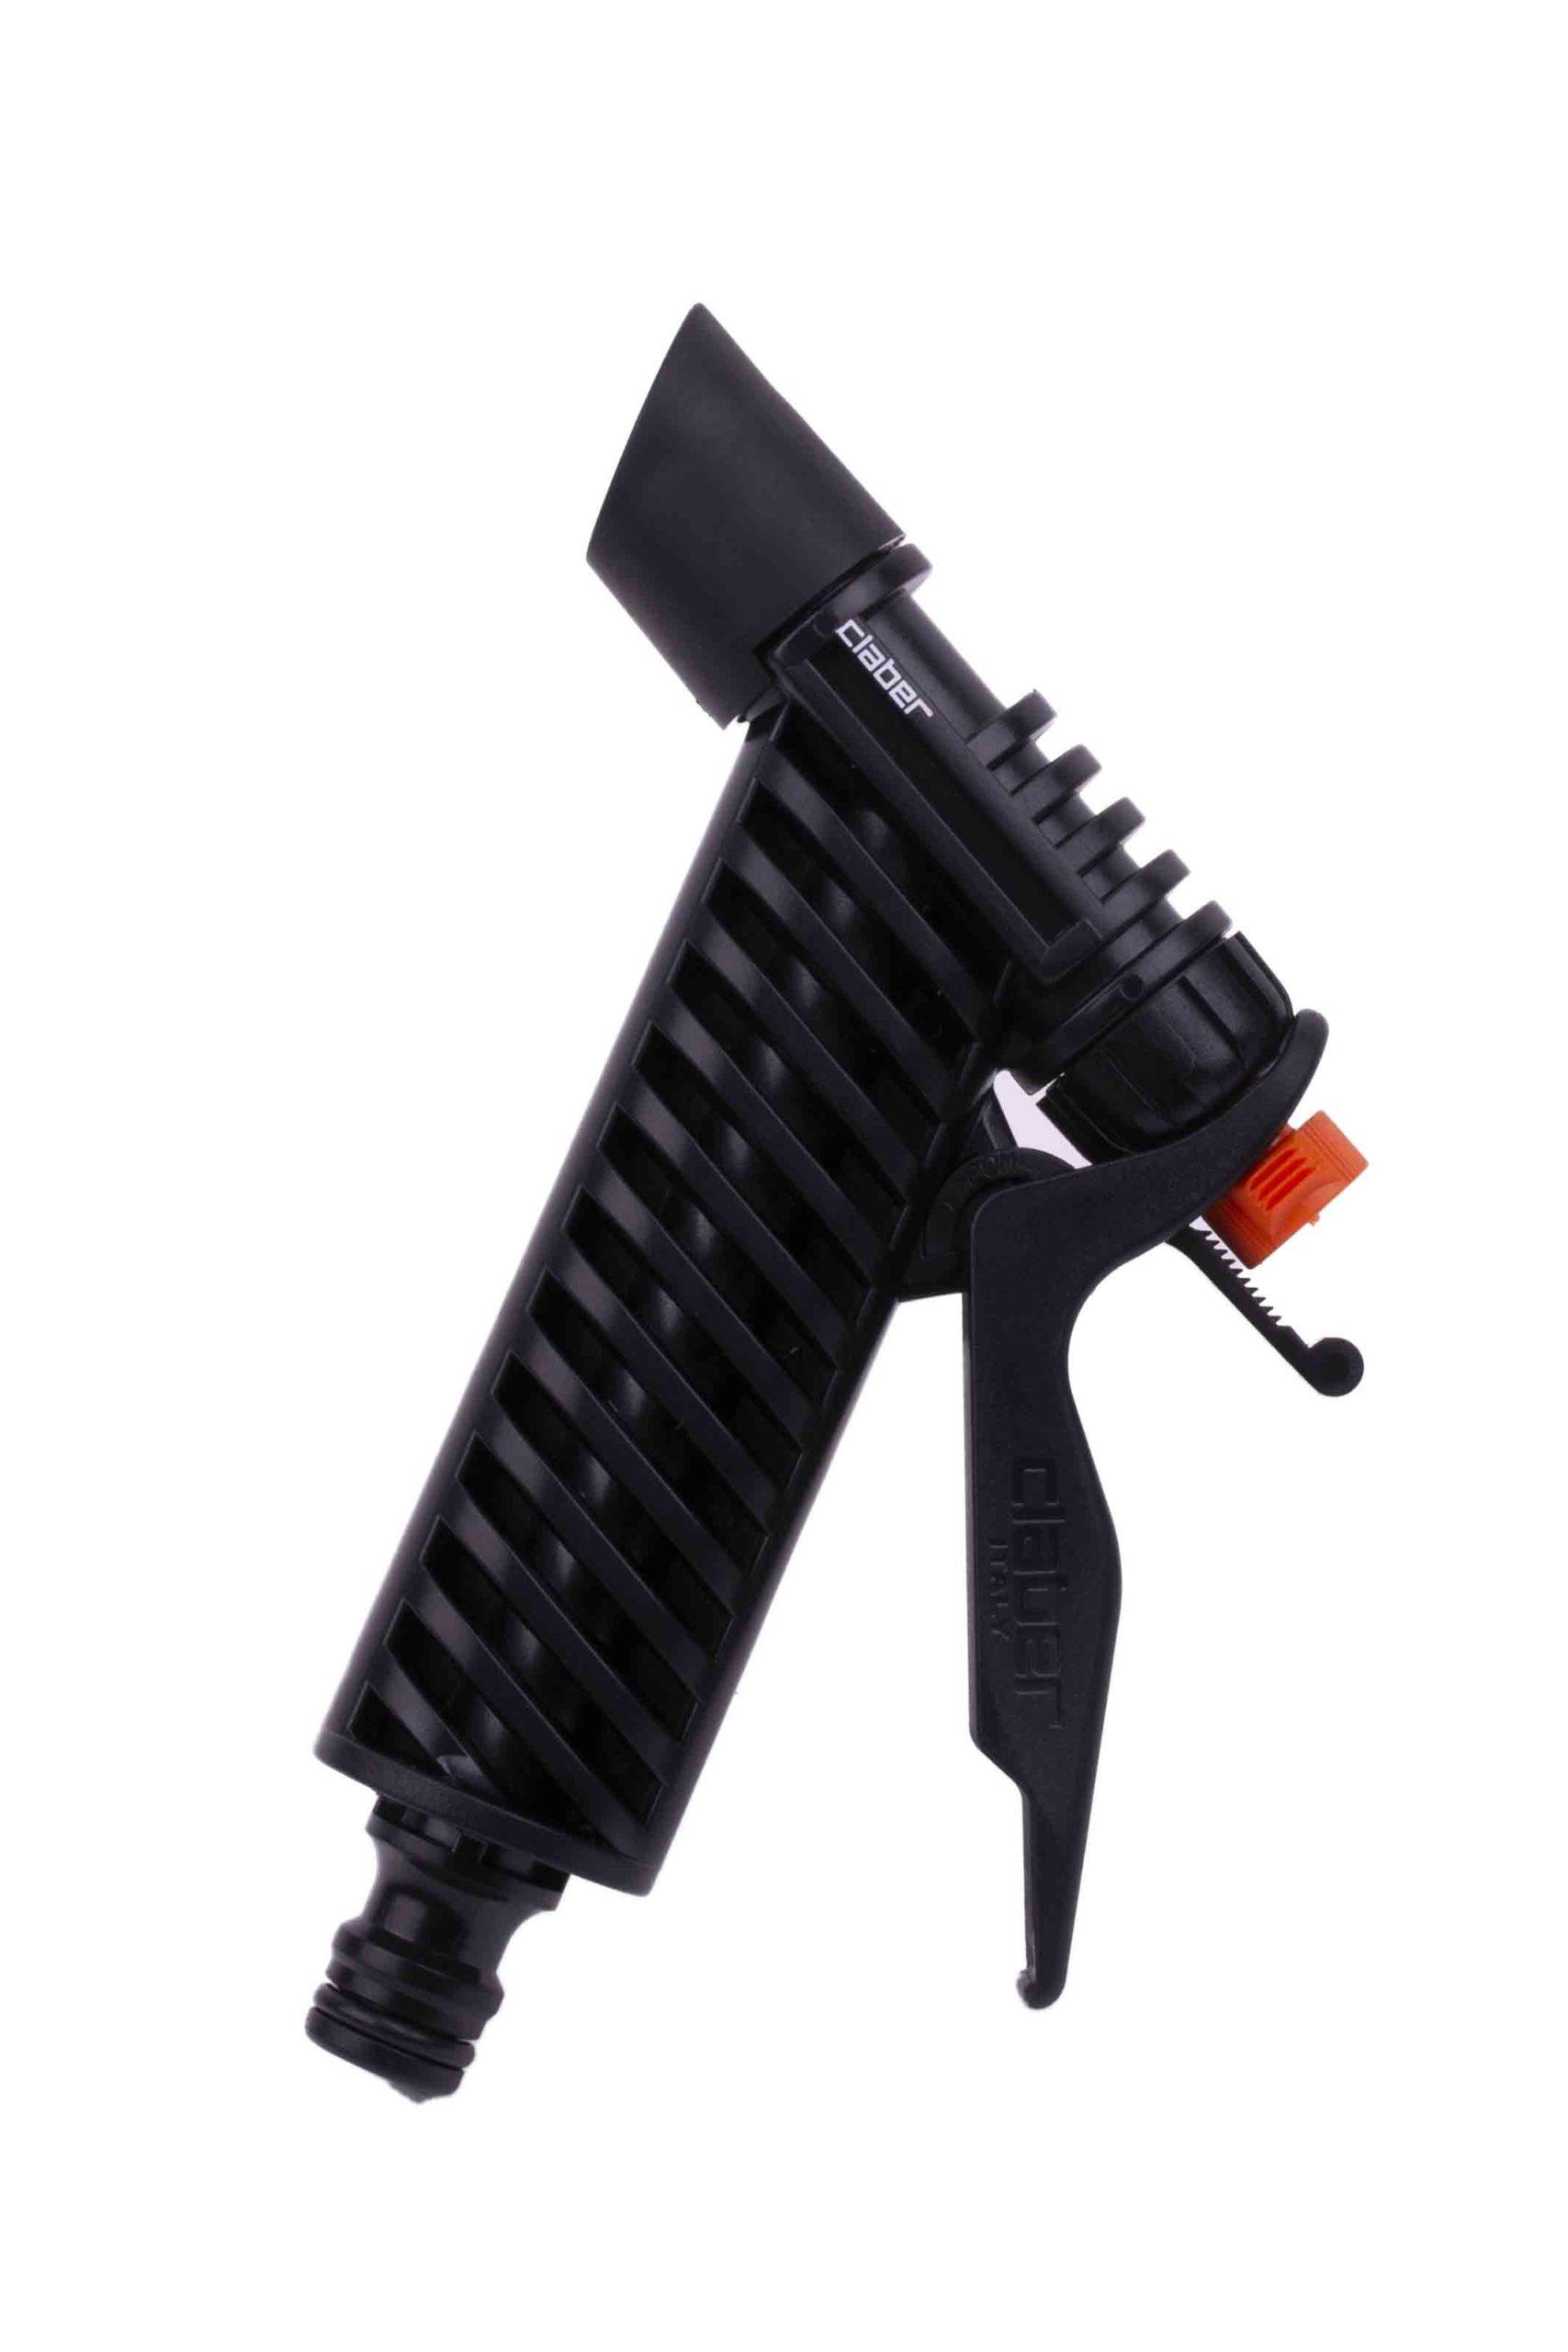 pistola pequeña